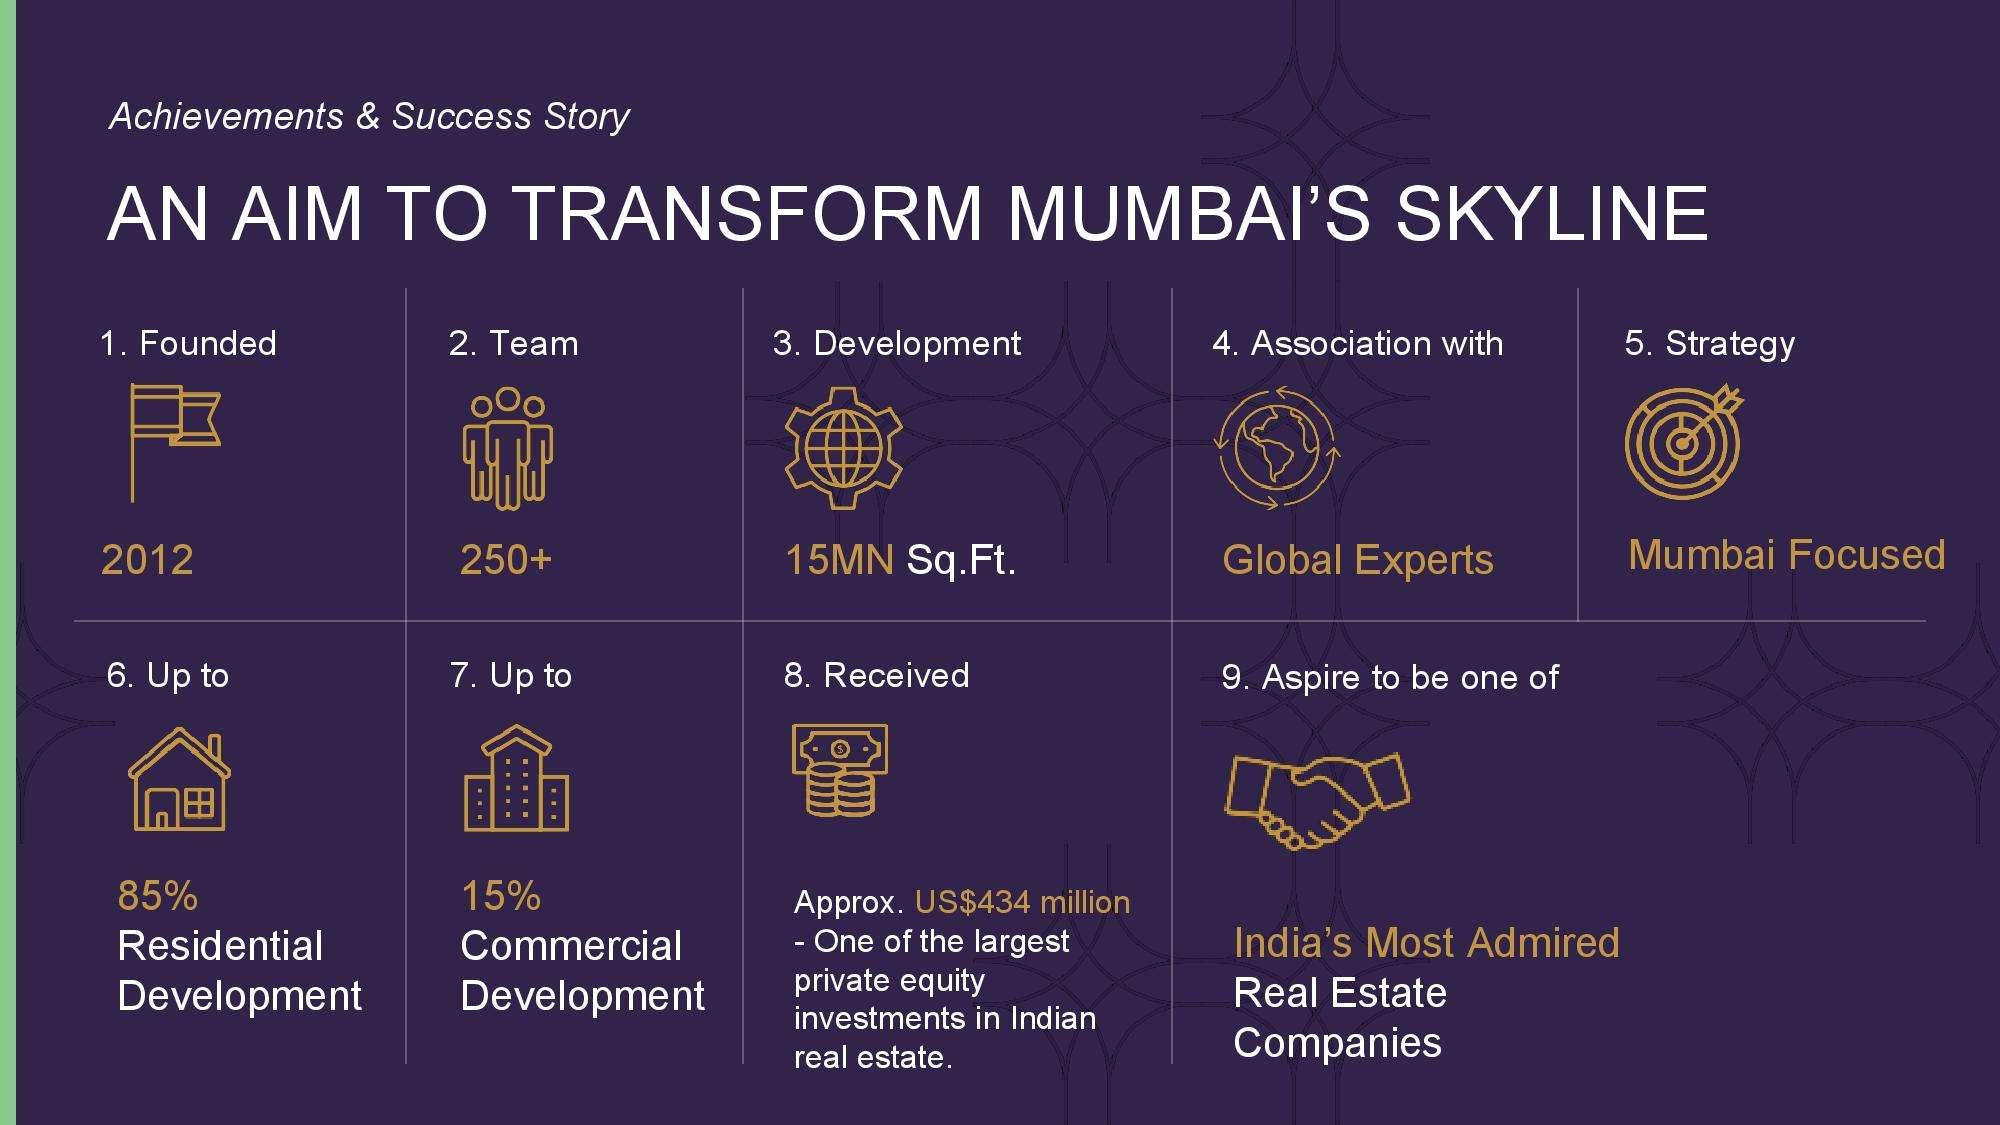 Piramal Realty Launches Piramal Mahalaxmi, its Flagship Project in South Mumbai Contact for more details & booking @ 9958959555